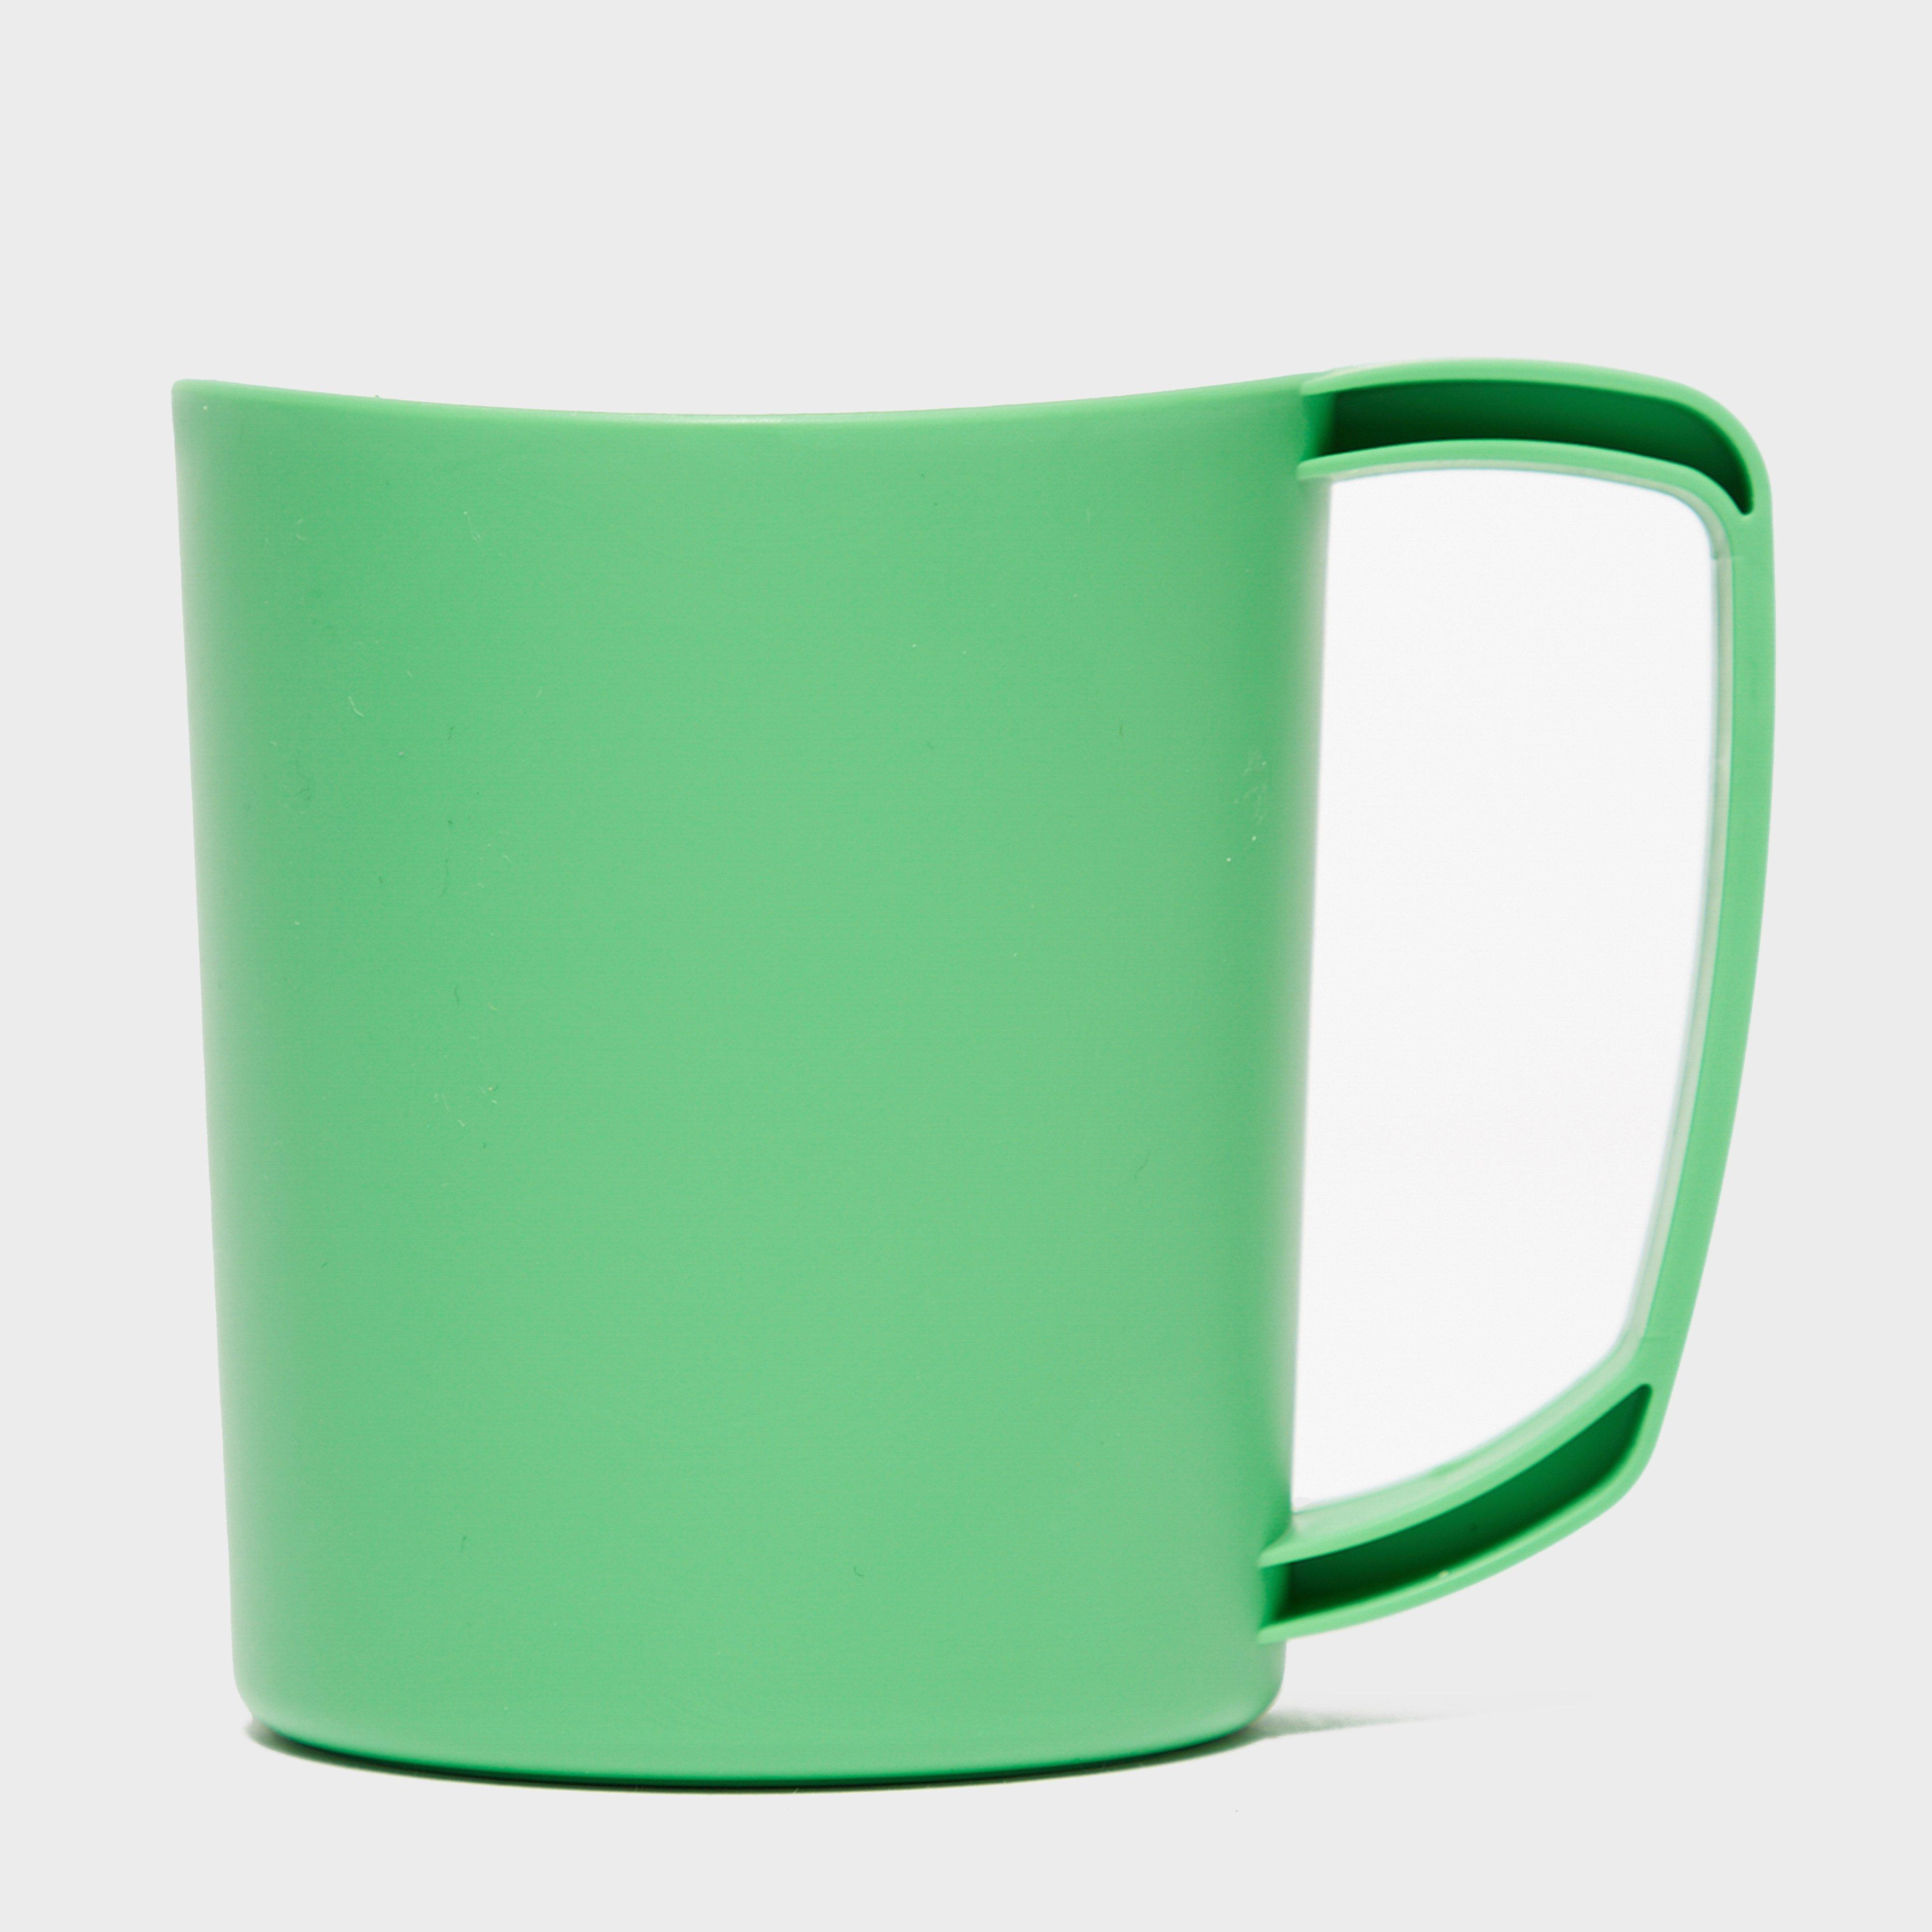 LIFEVENTURE Ellipse Camping Mug, Green